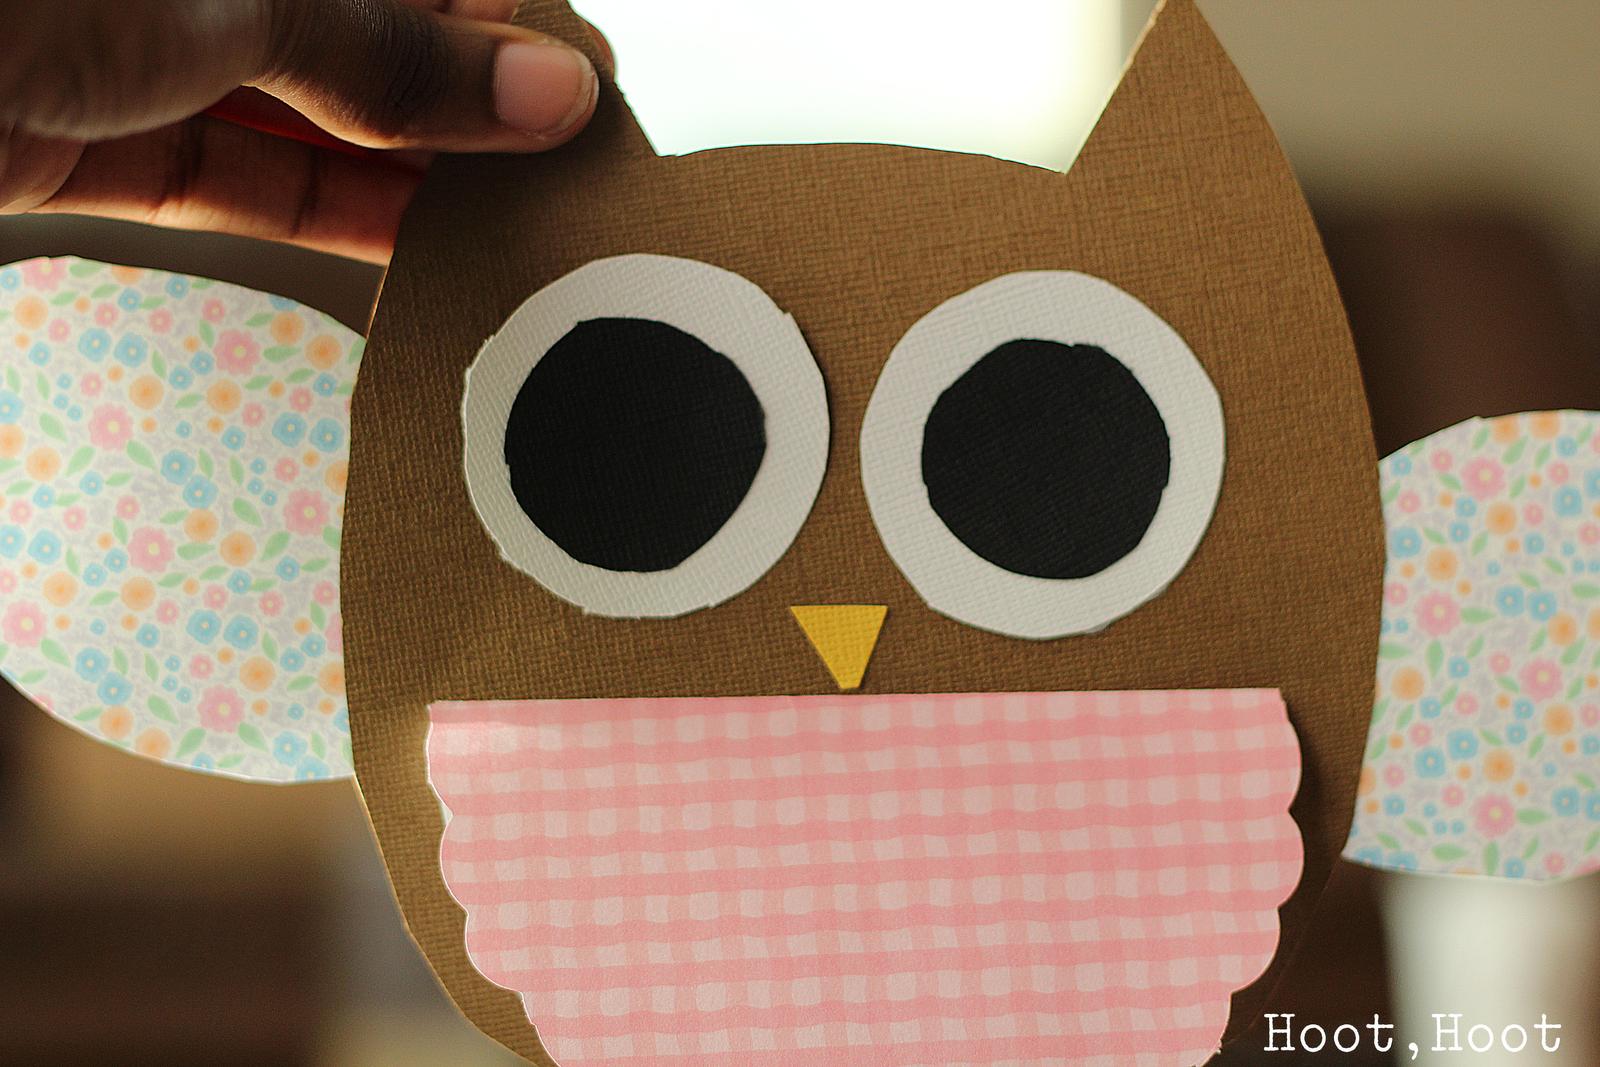 2 cool teachers Cara Carroll's writing owl : )